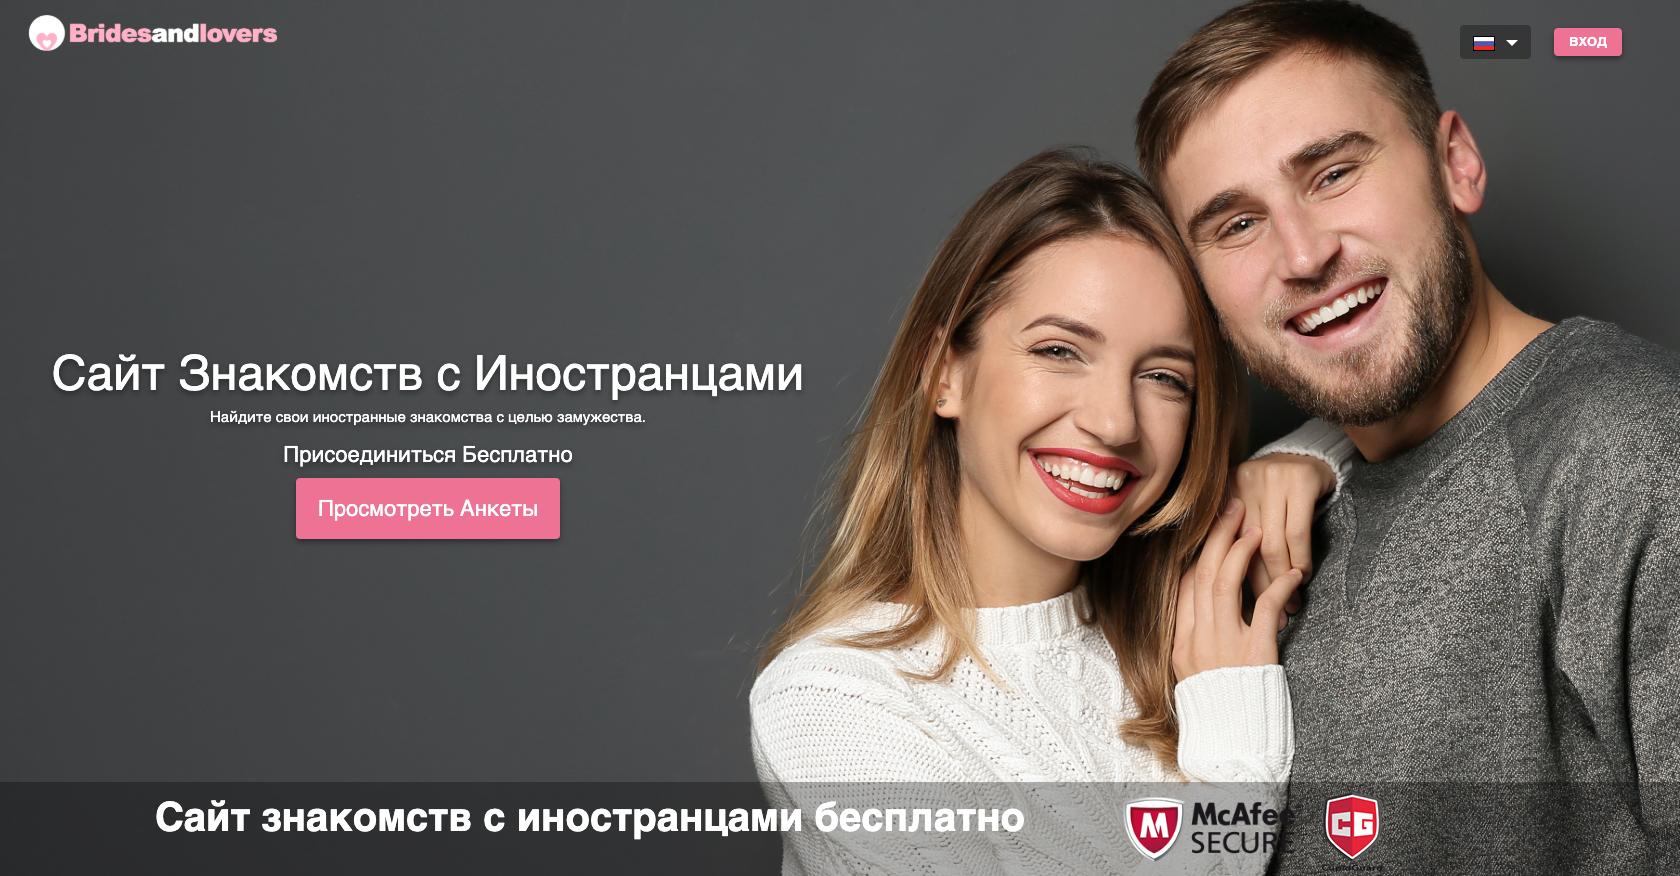 Клуб знакомств одиноких мужчин фитнес клубы москвы сити